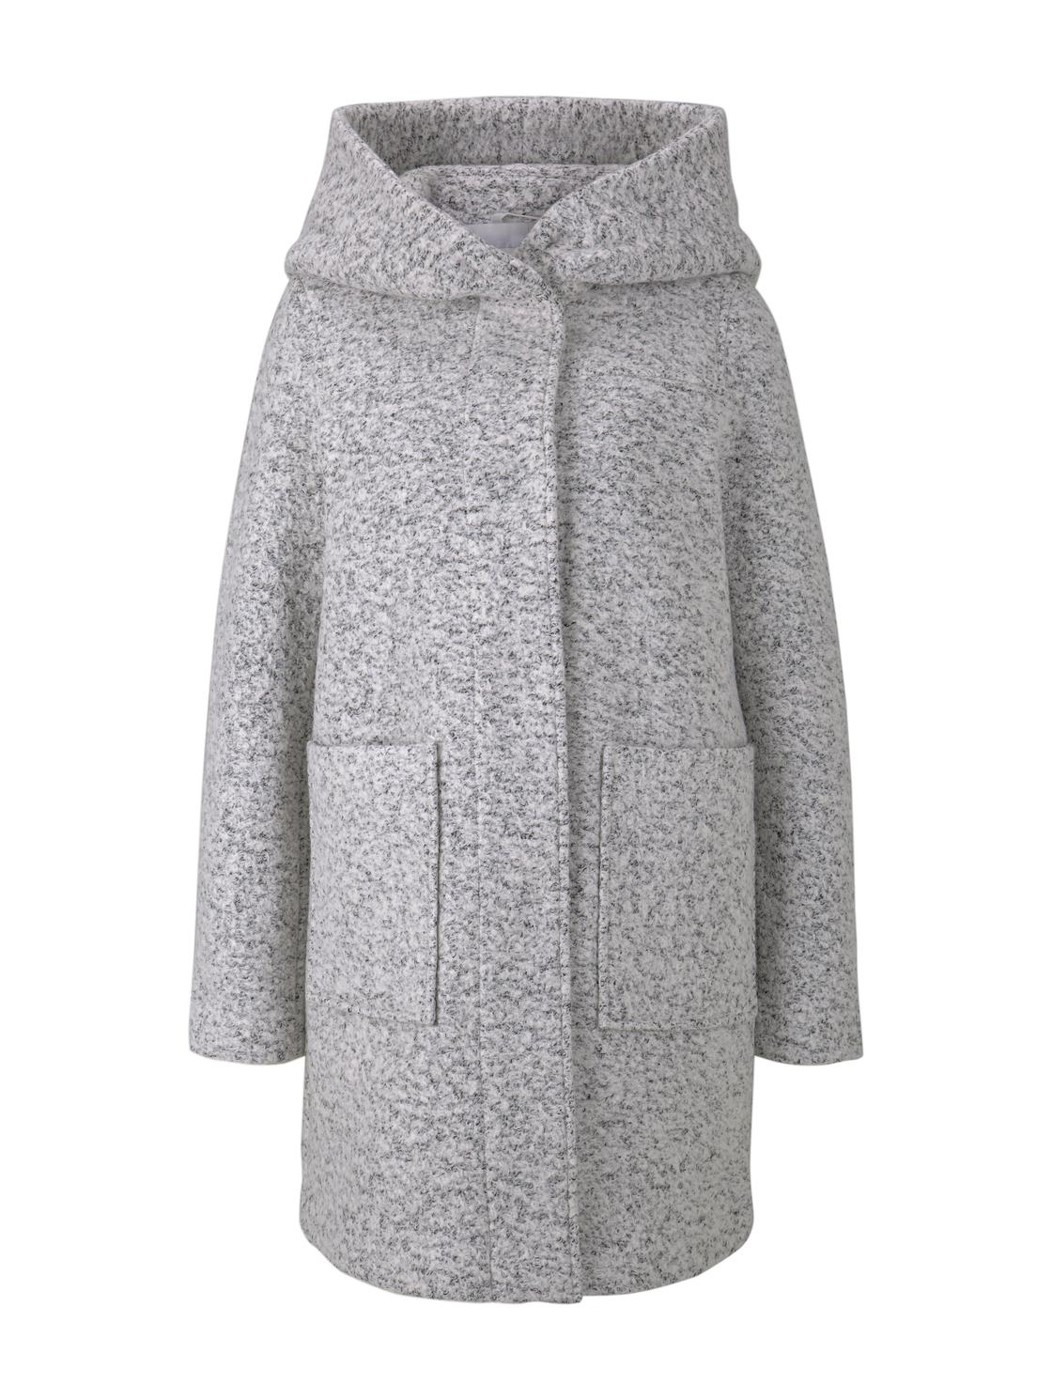 boucle wool coat with hood - Damen